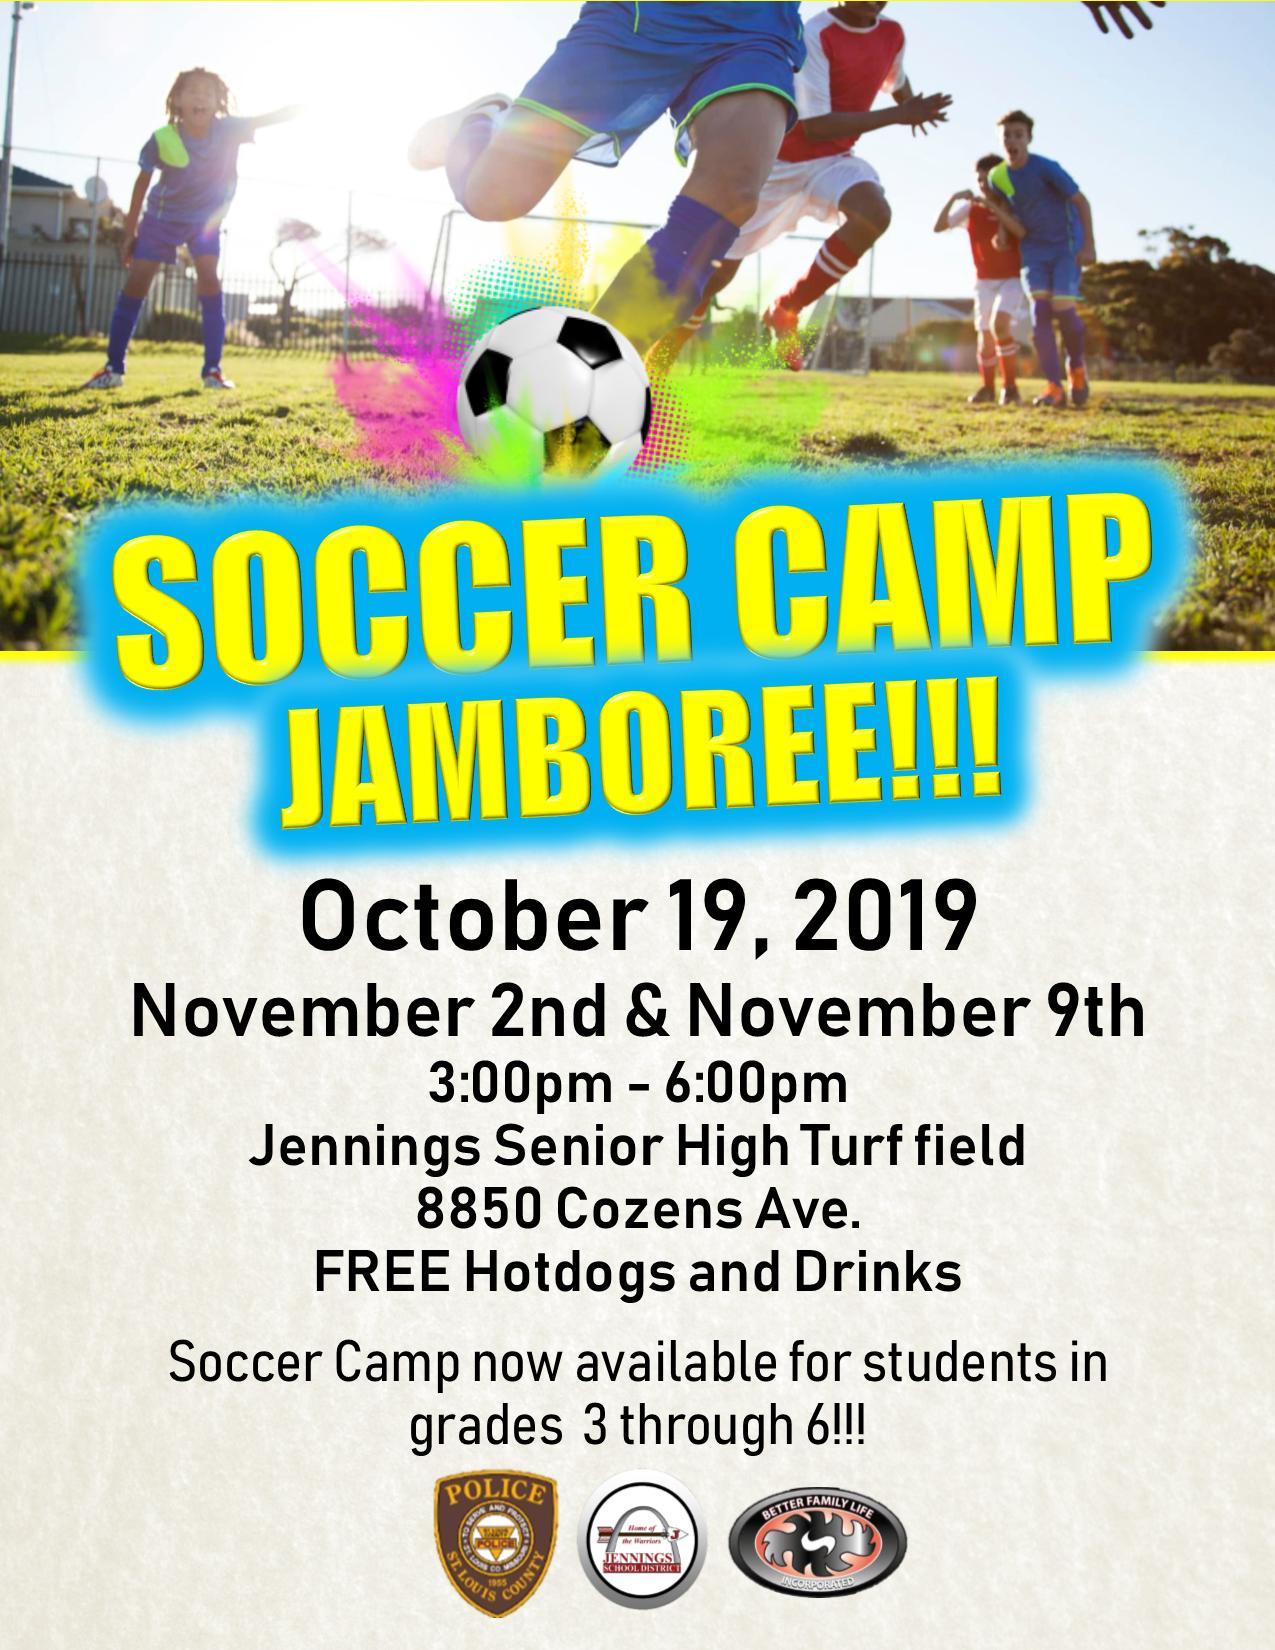 Soccer Camp Jamboree